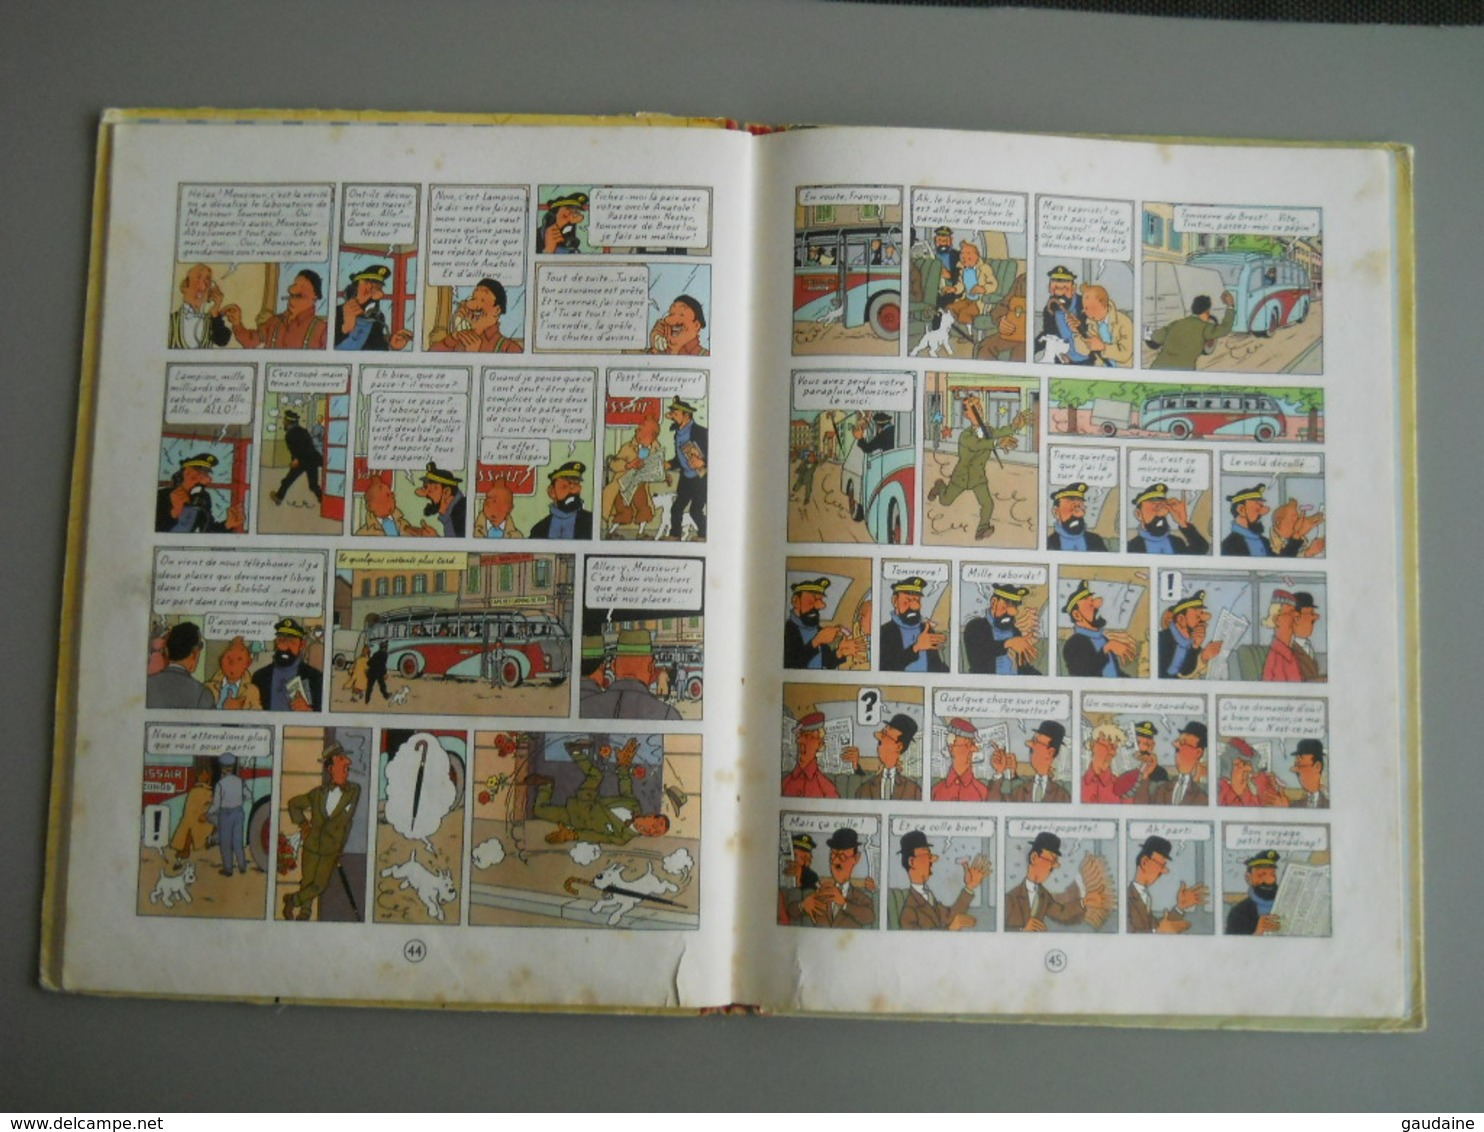 TINTIN – L'AFFAIRE TOURNESOL – B35 – Edition 1964 - Tintin